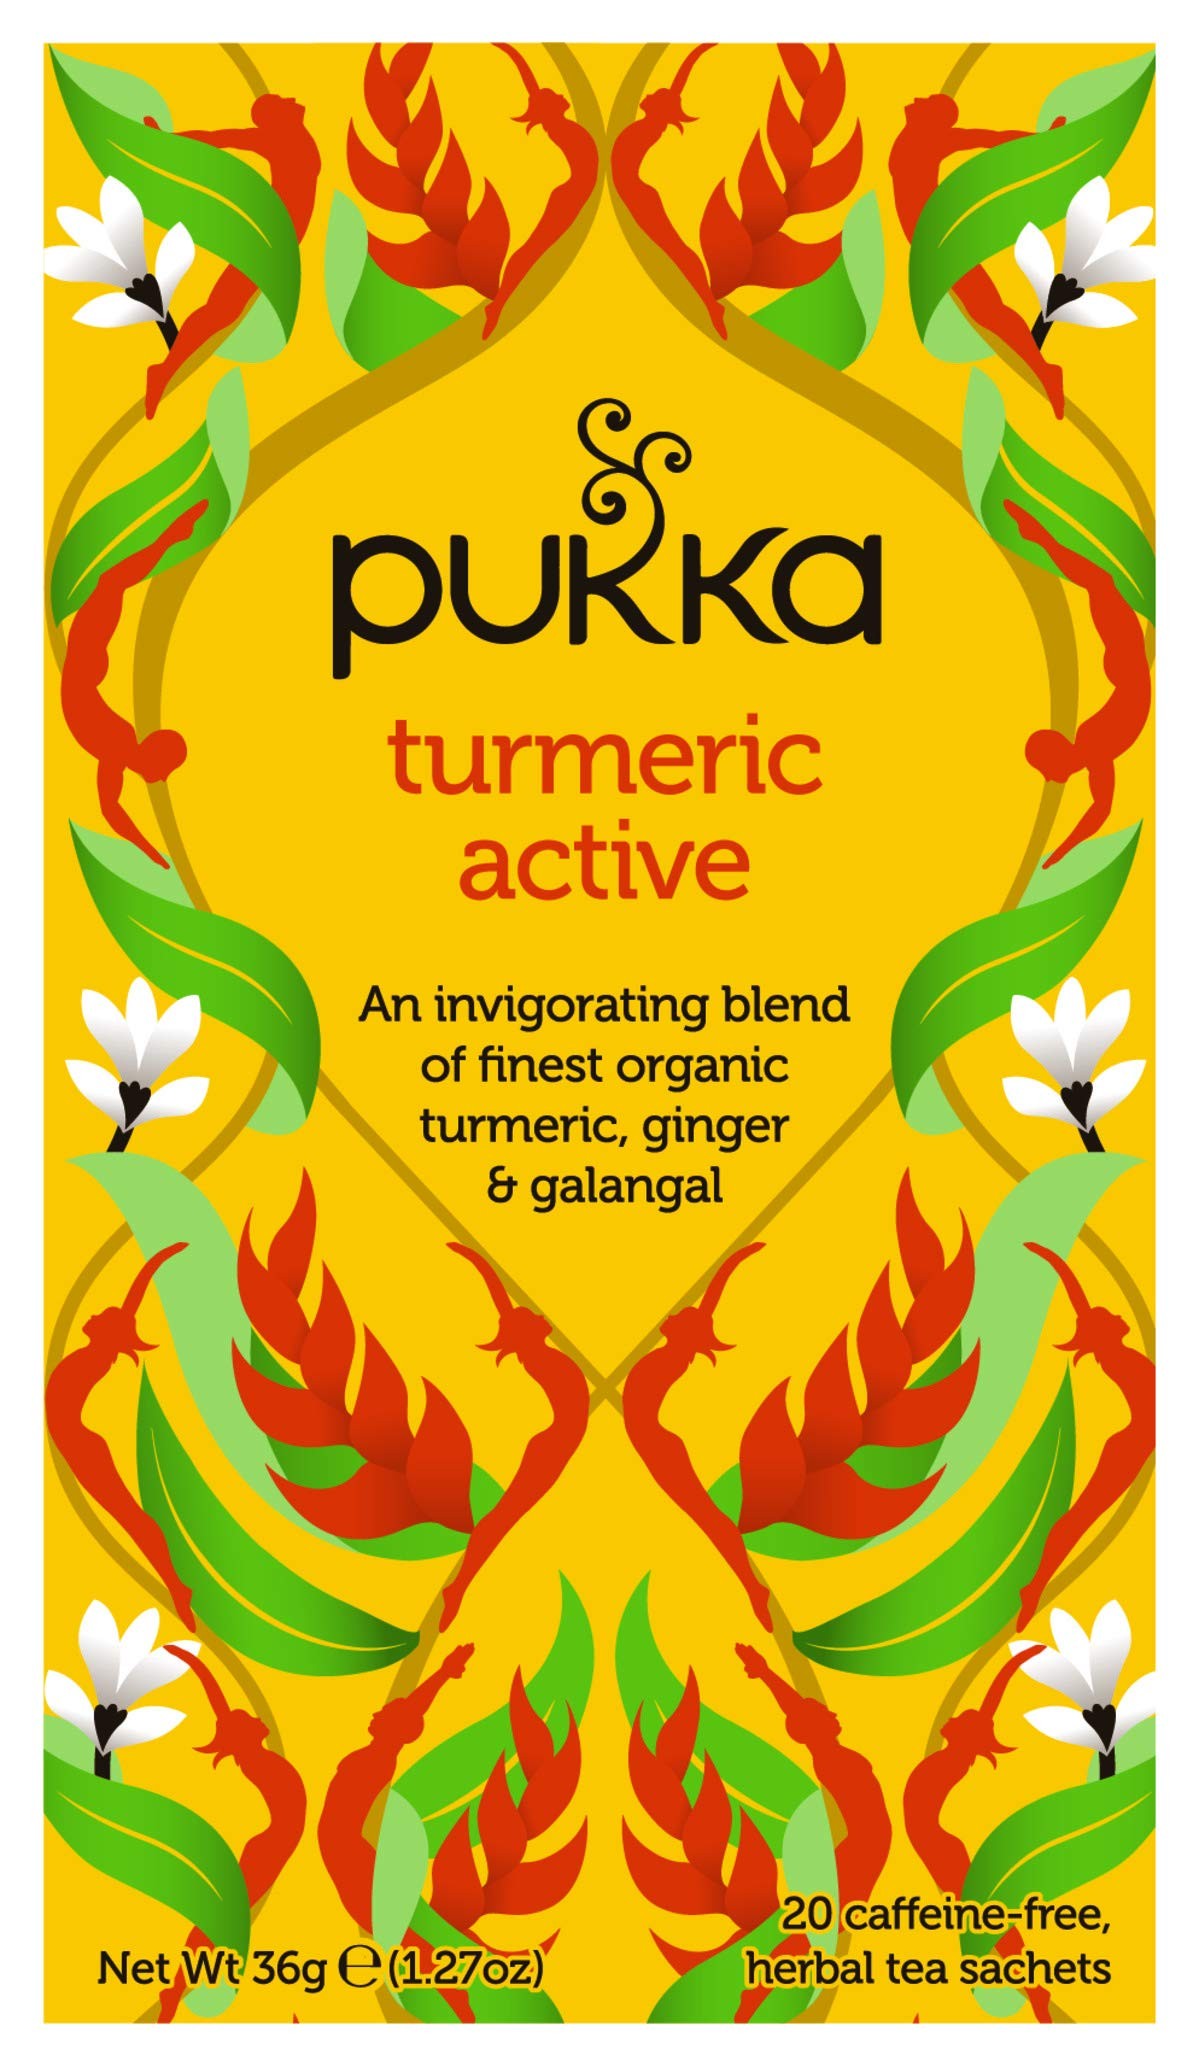 Pukka Turmeric range tea (soil association) (green tea) (20 bags) (a fruity, spicy, vegetal tea with aromas of cardamom, lemon, liquorice, turmeric) (brews in up to 15 min)